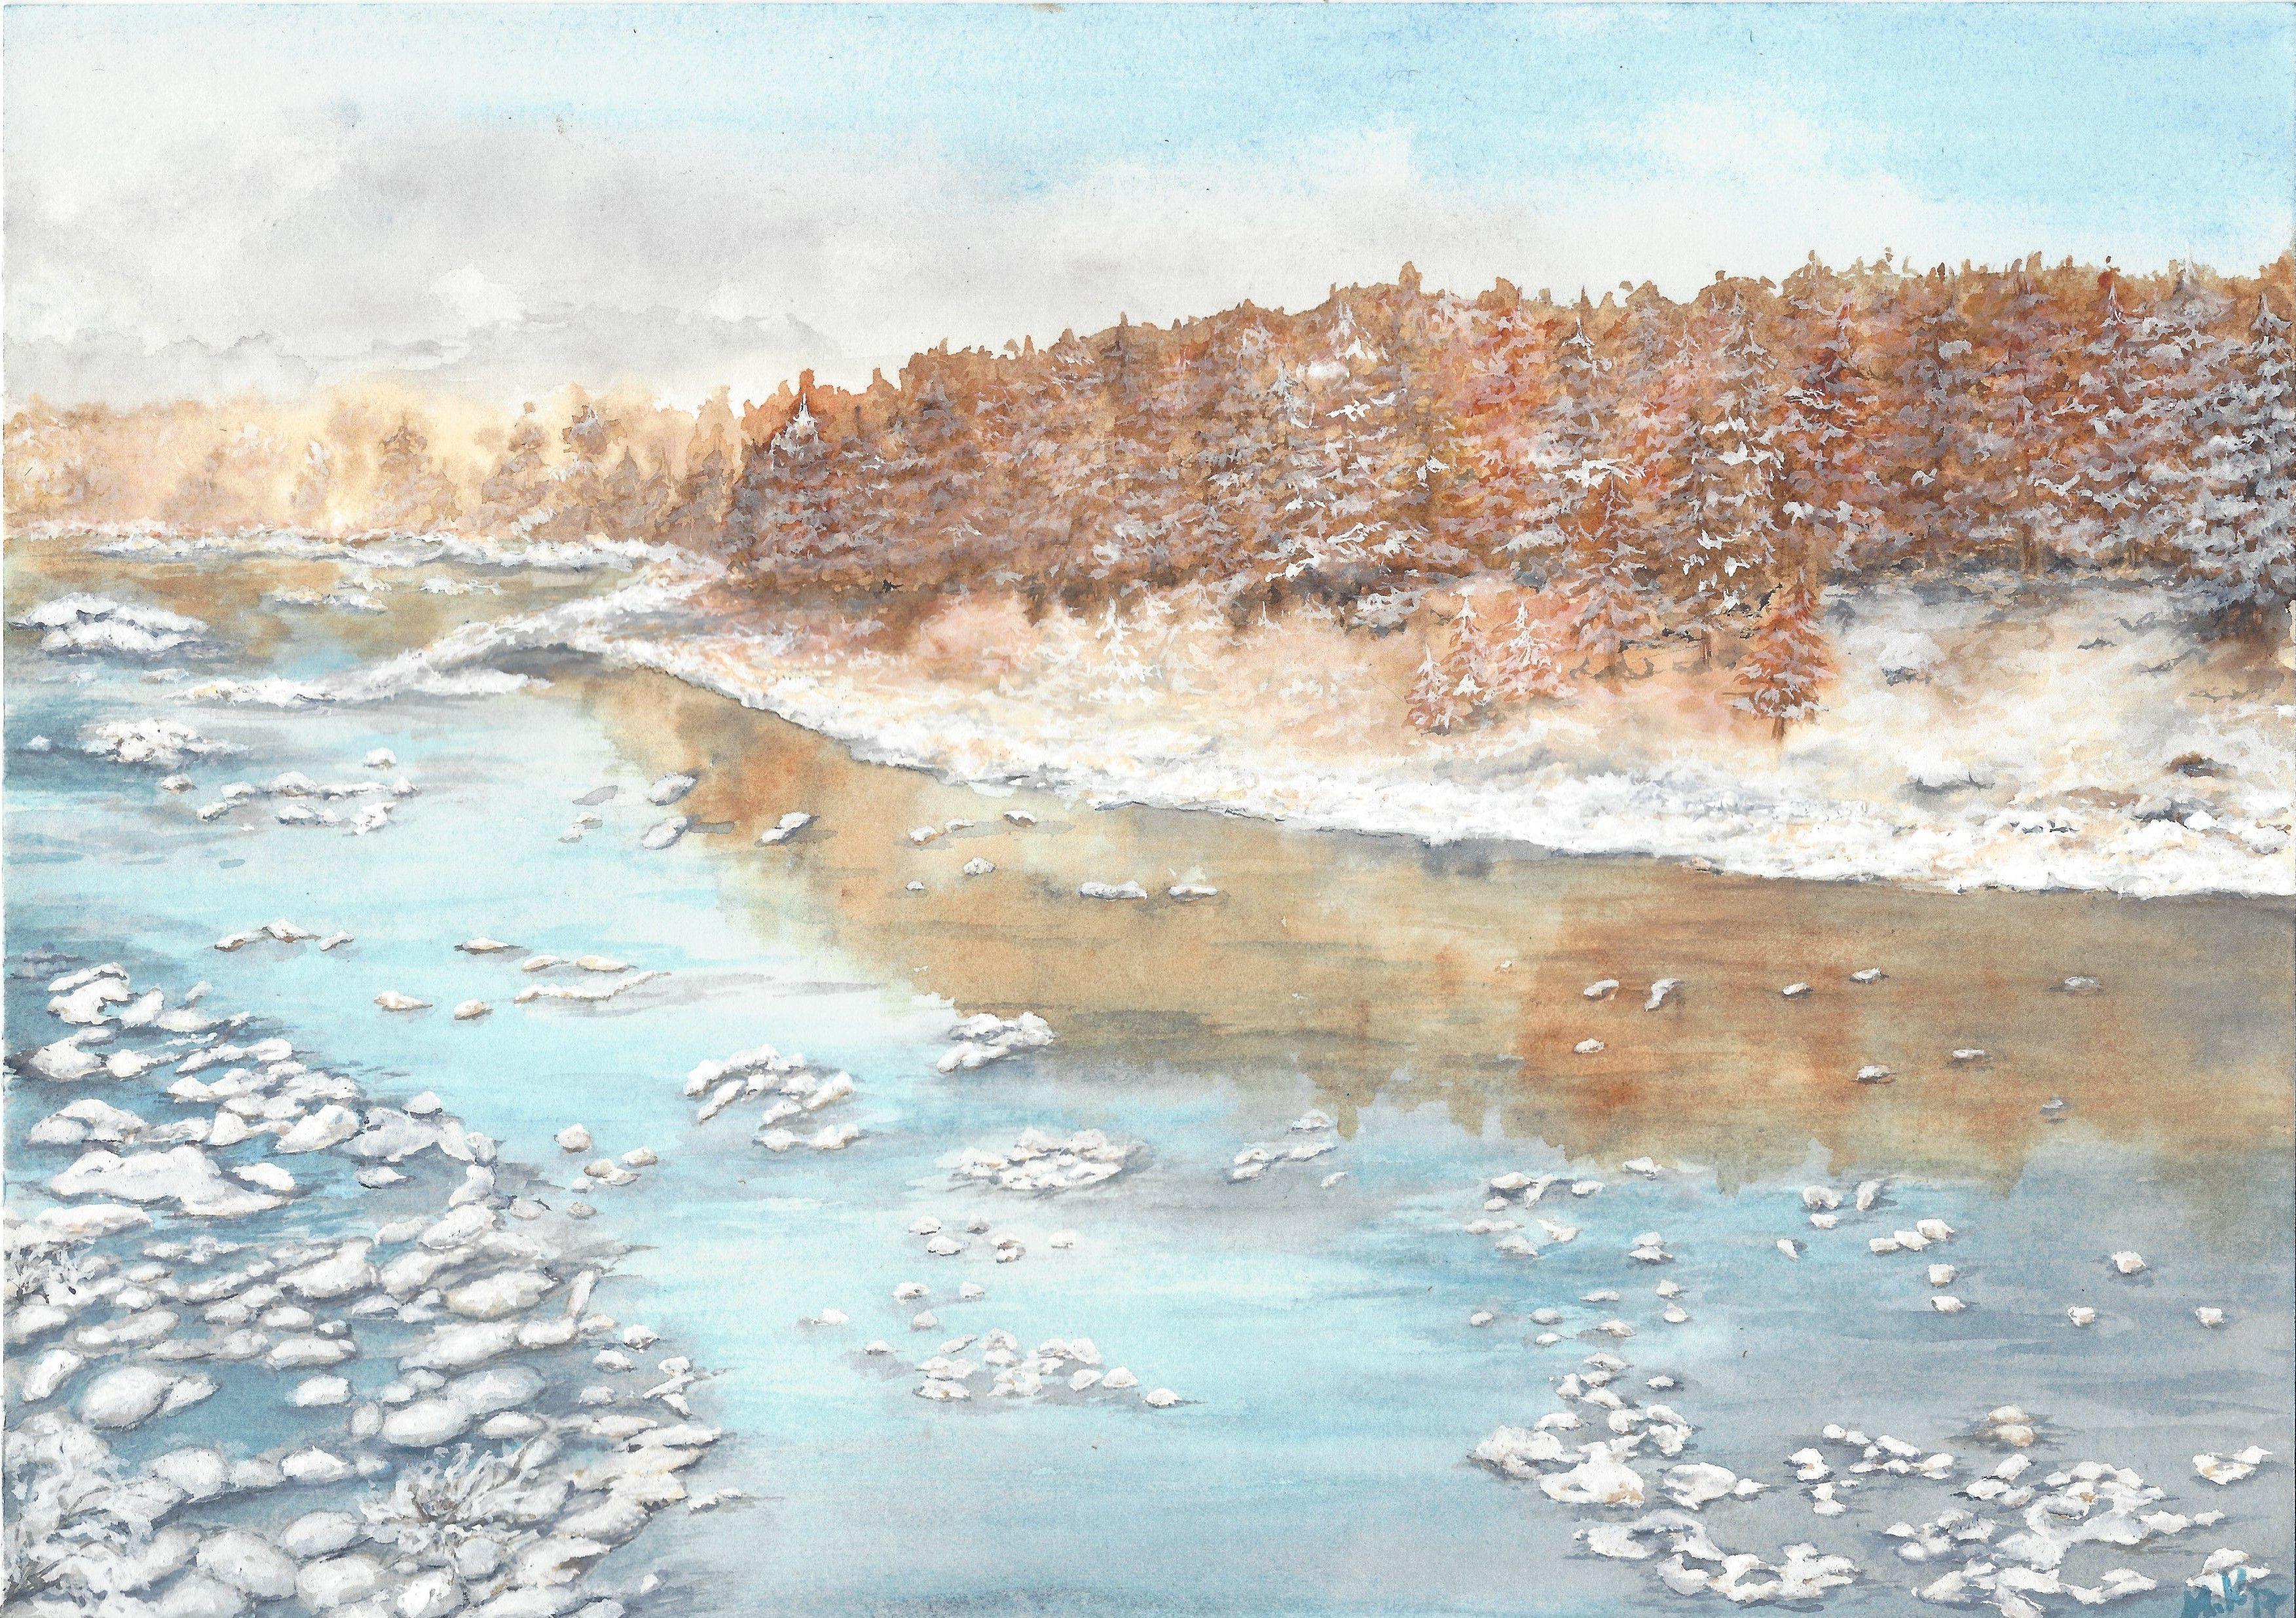 landscape wallart walldecoration winterpainting riverpainting christmasgift watercolor homedecor